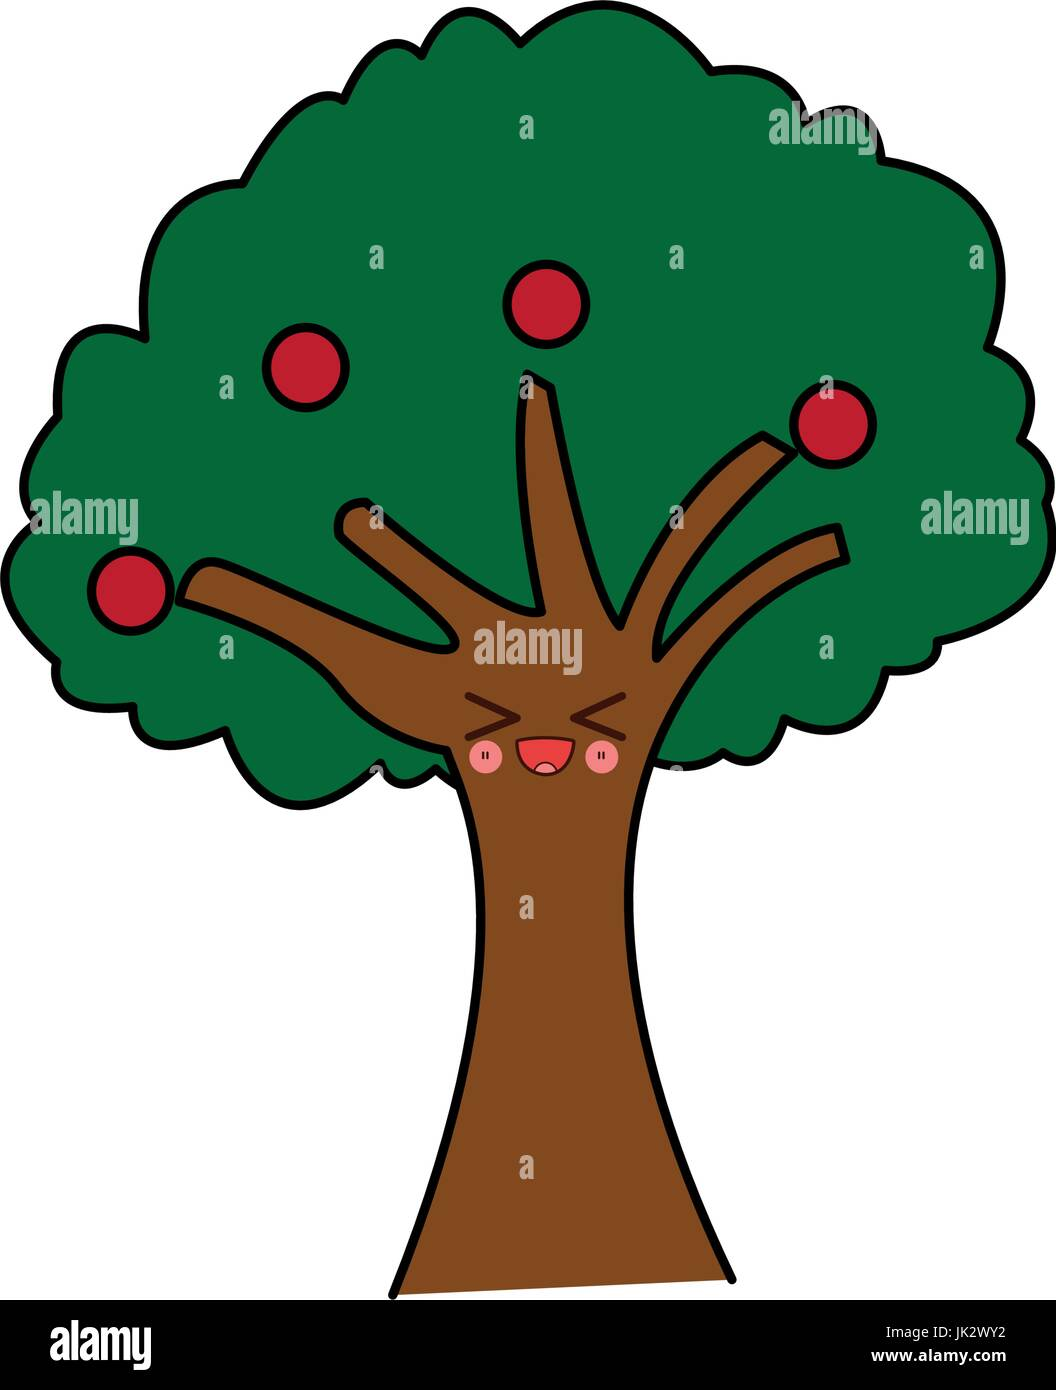 kawaii tree natural foliage branch fruits cartoon - Stock Vector